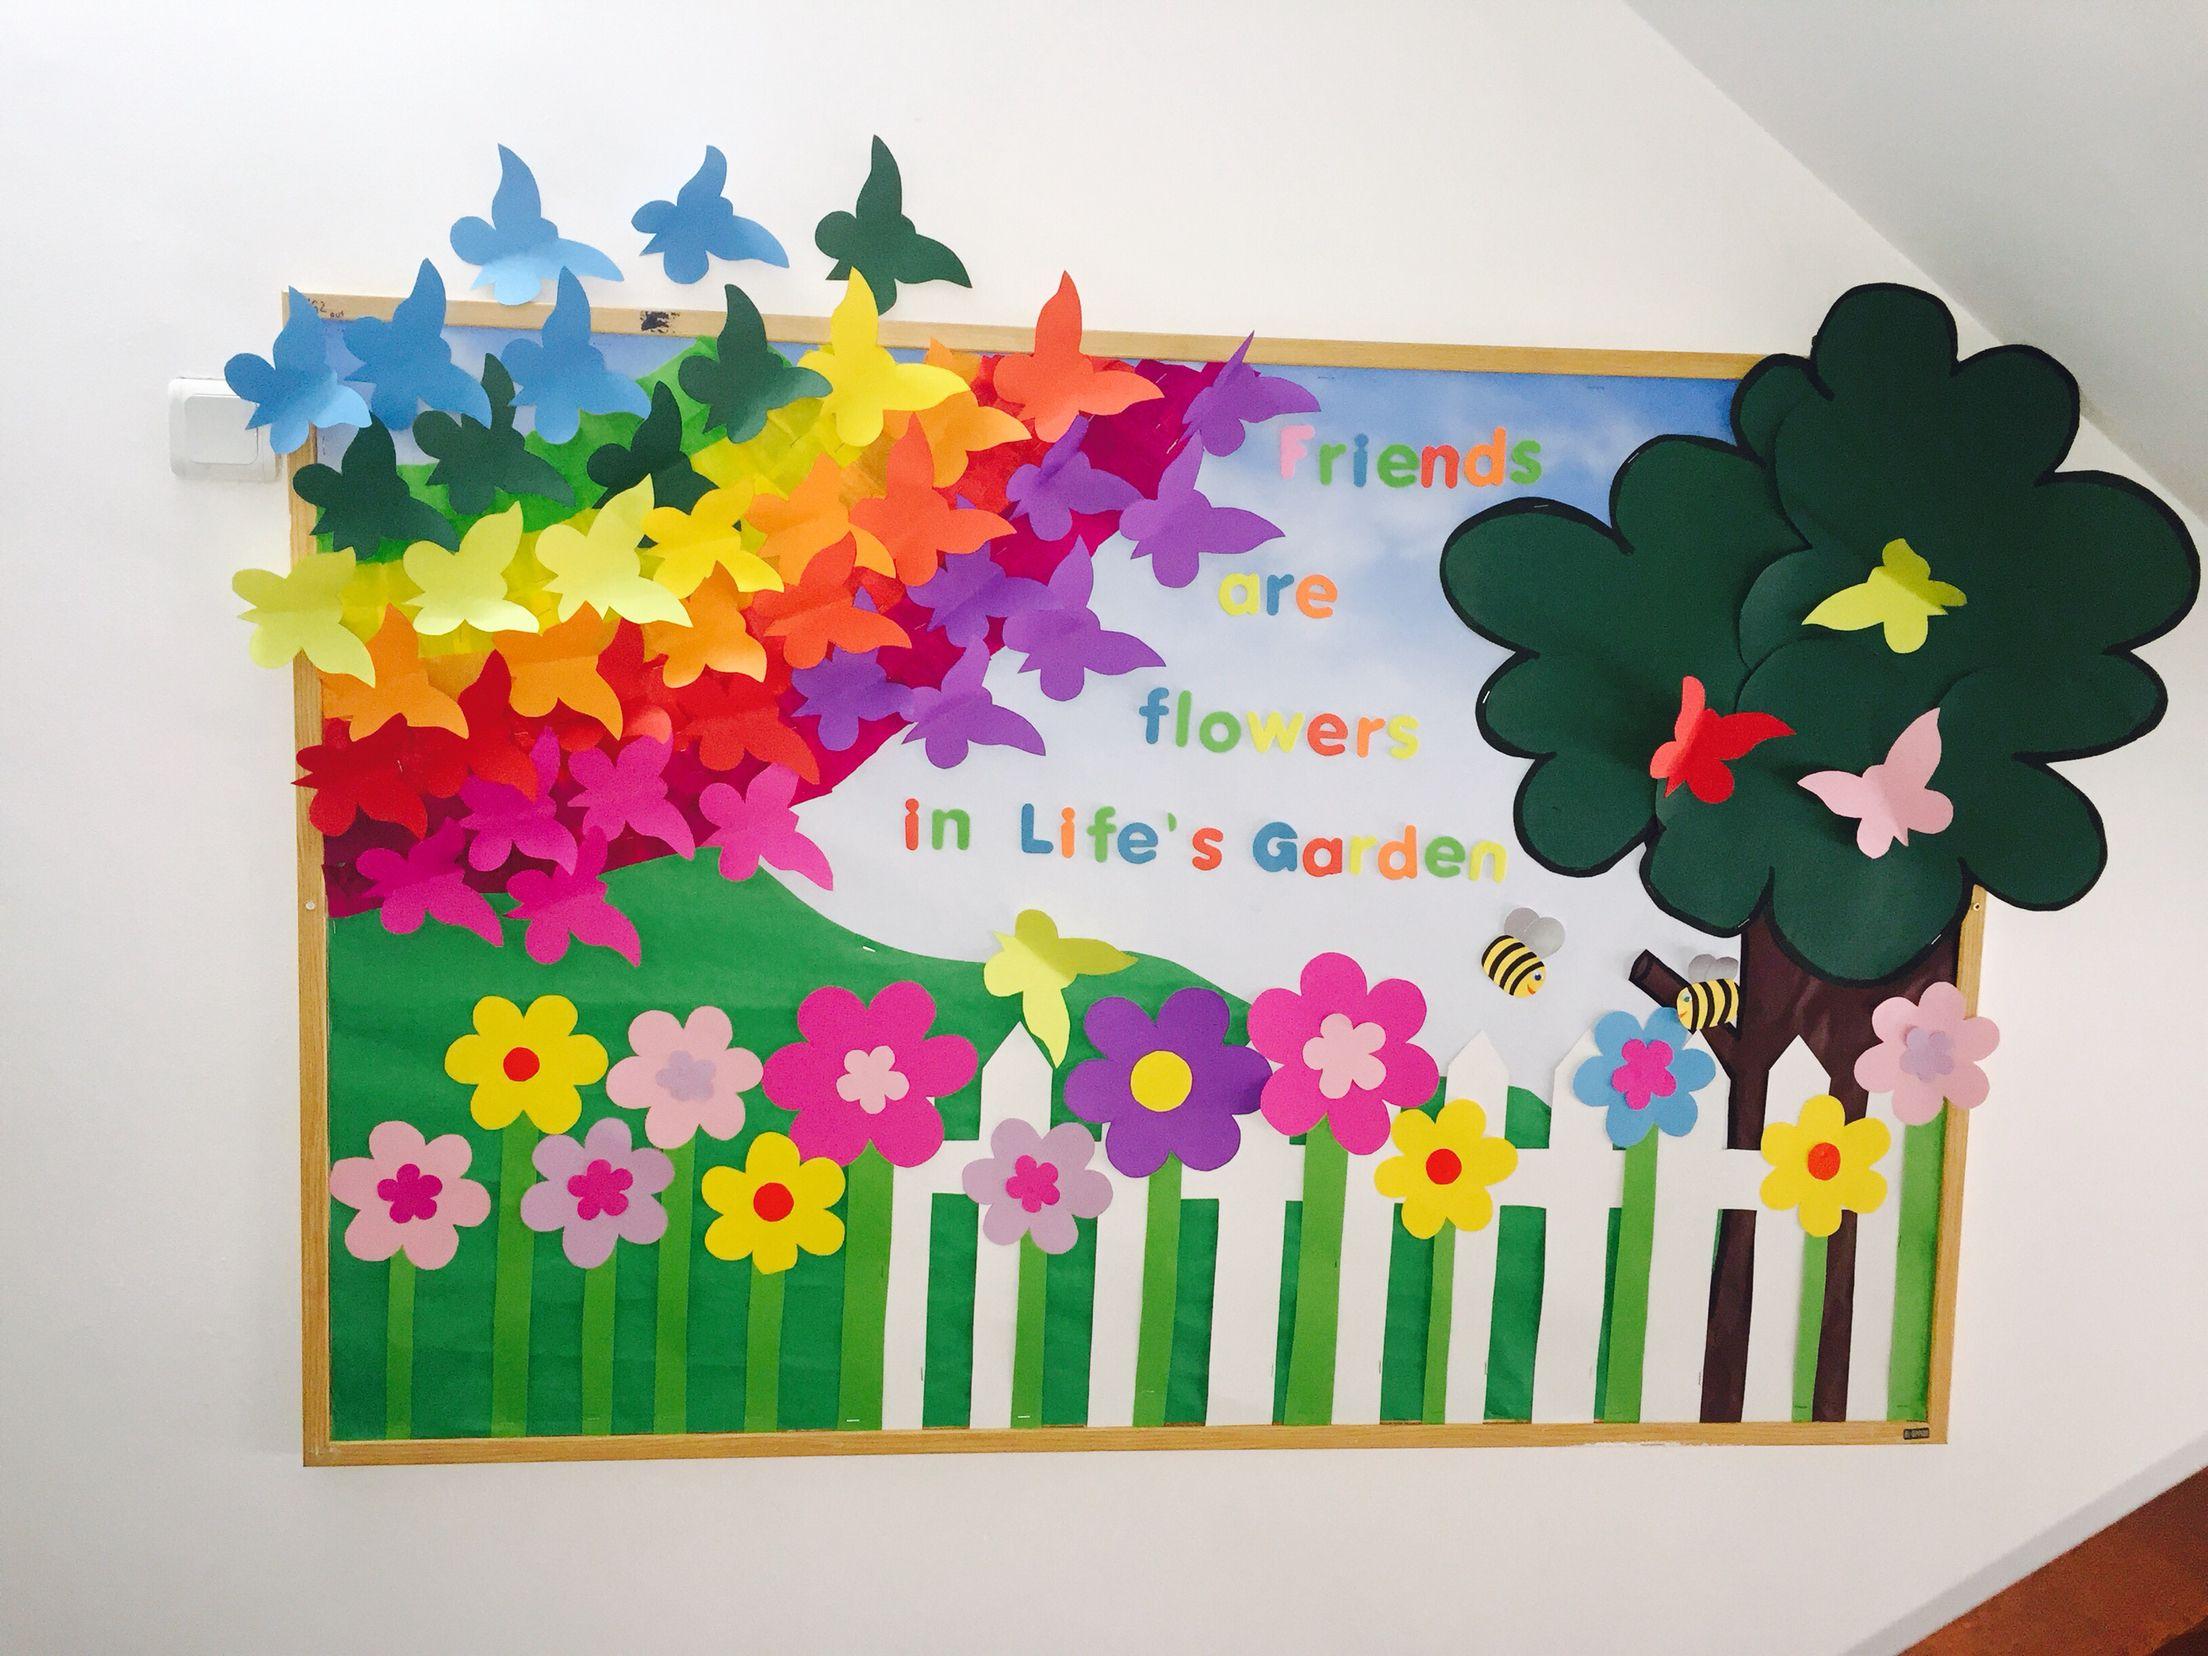 Bulletin Boards, Friends are Flowers in Life's Garden, school, preschool, kindergarten, spring, flowers, butterflies, rainbow, tree, colors